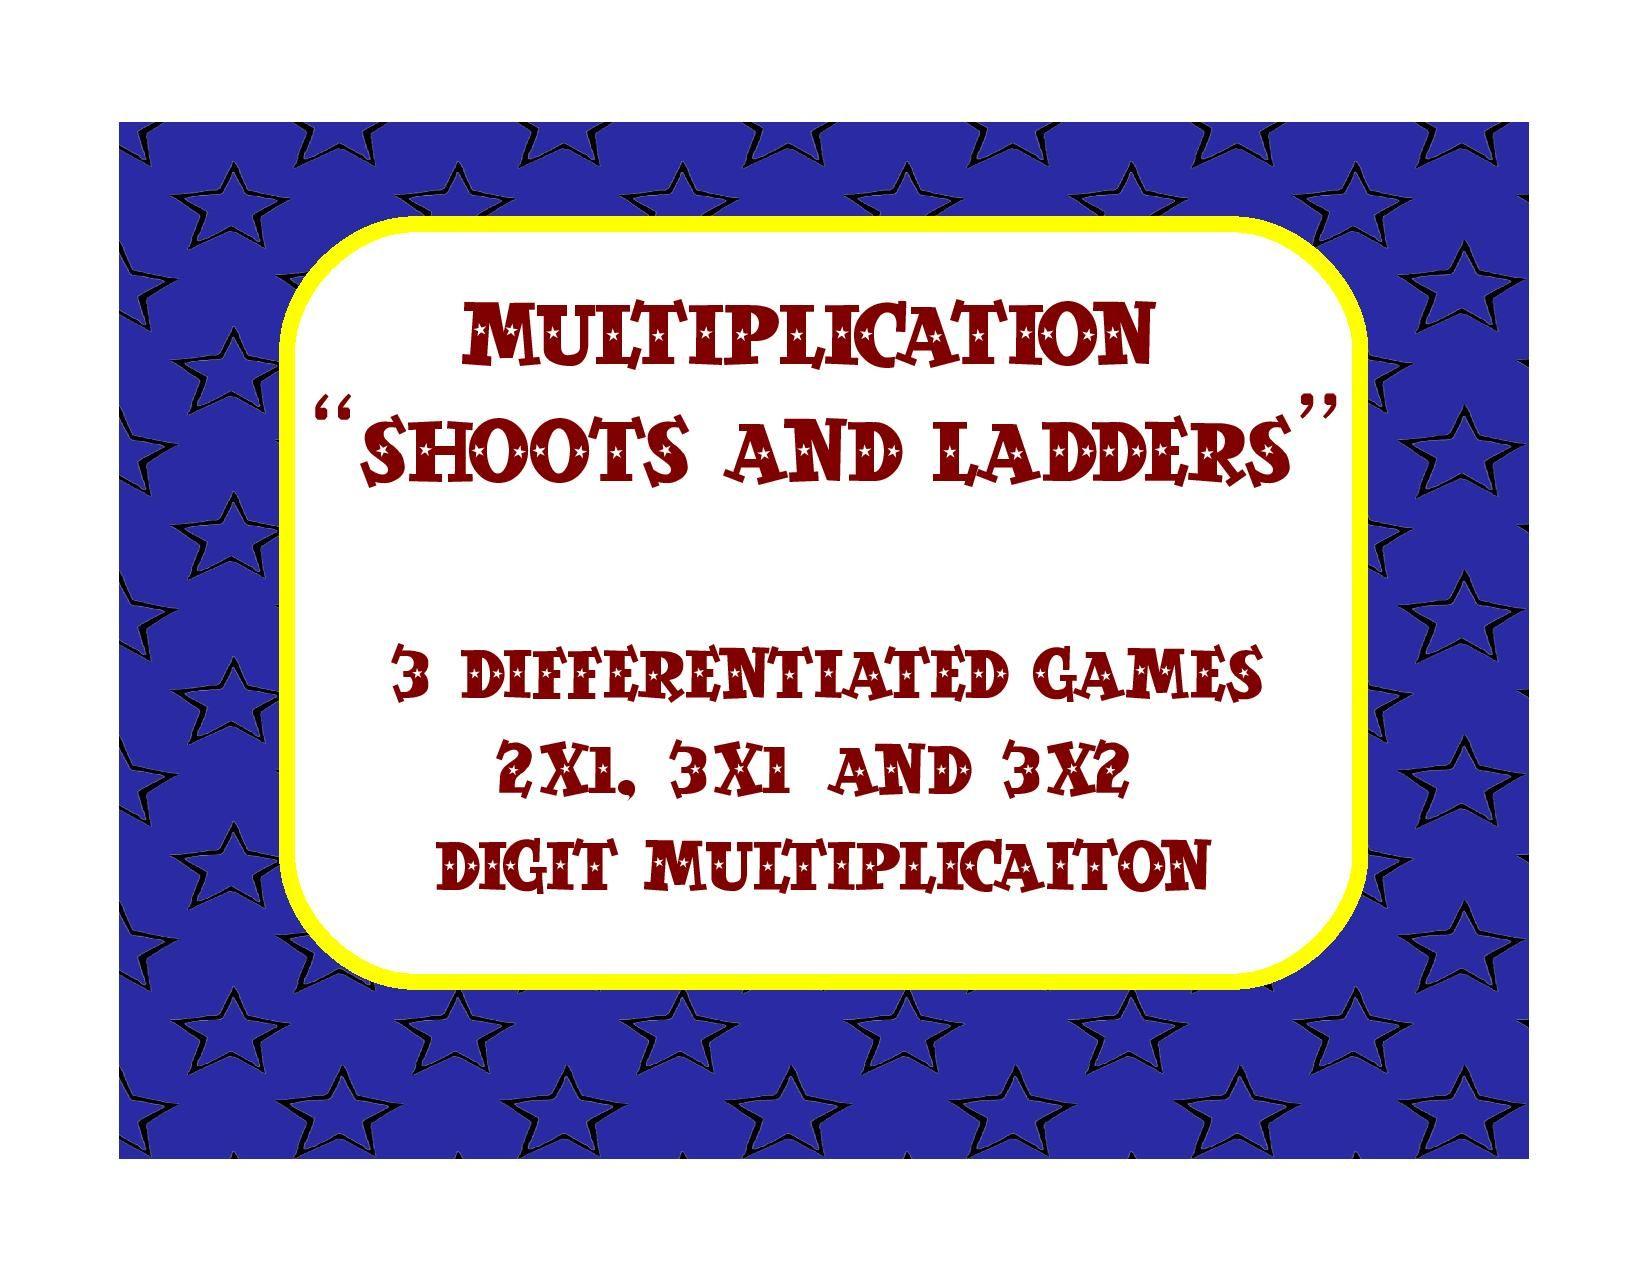 multiplication 39 shoots and ladders 39 math for kids long division multiplication games. Black Bedroom Furniture Sets. Home Design Ideas